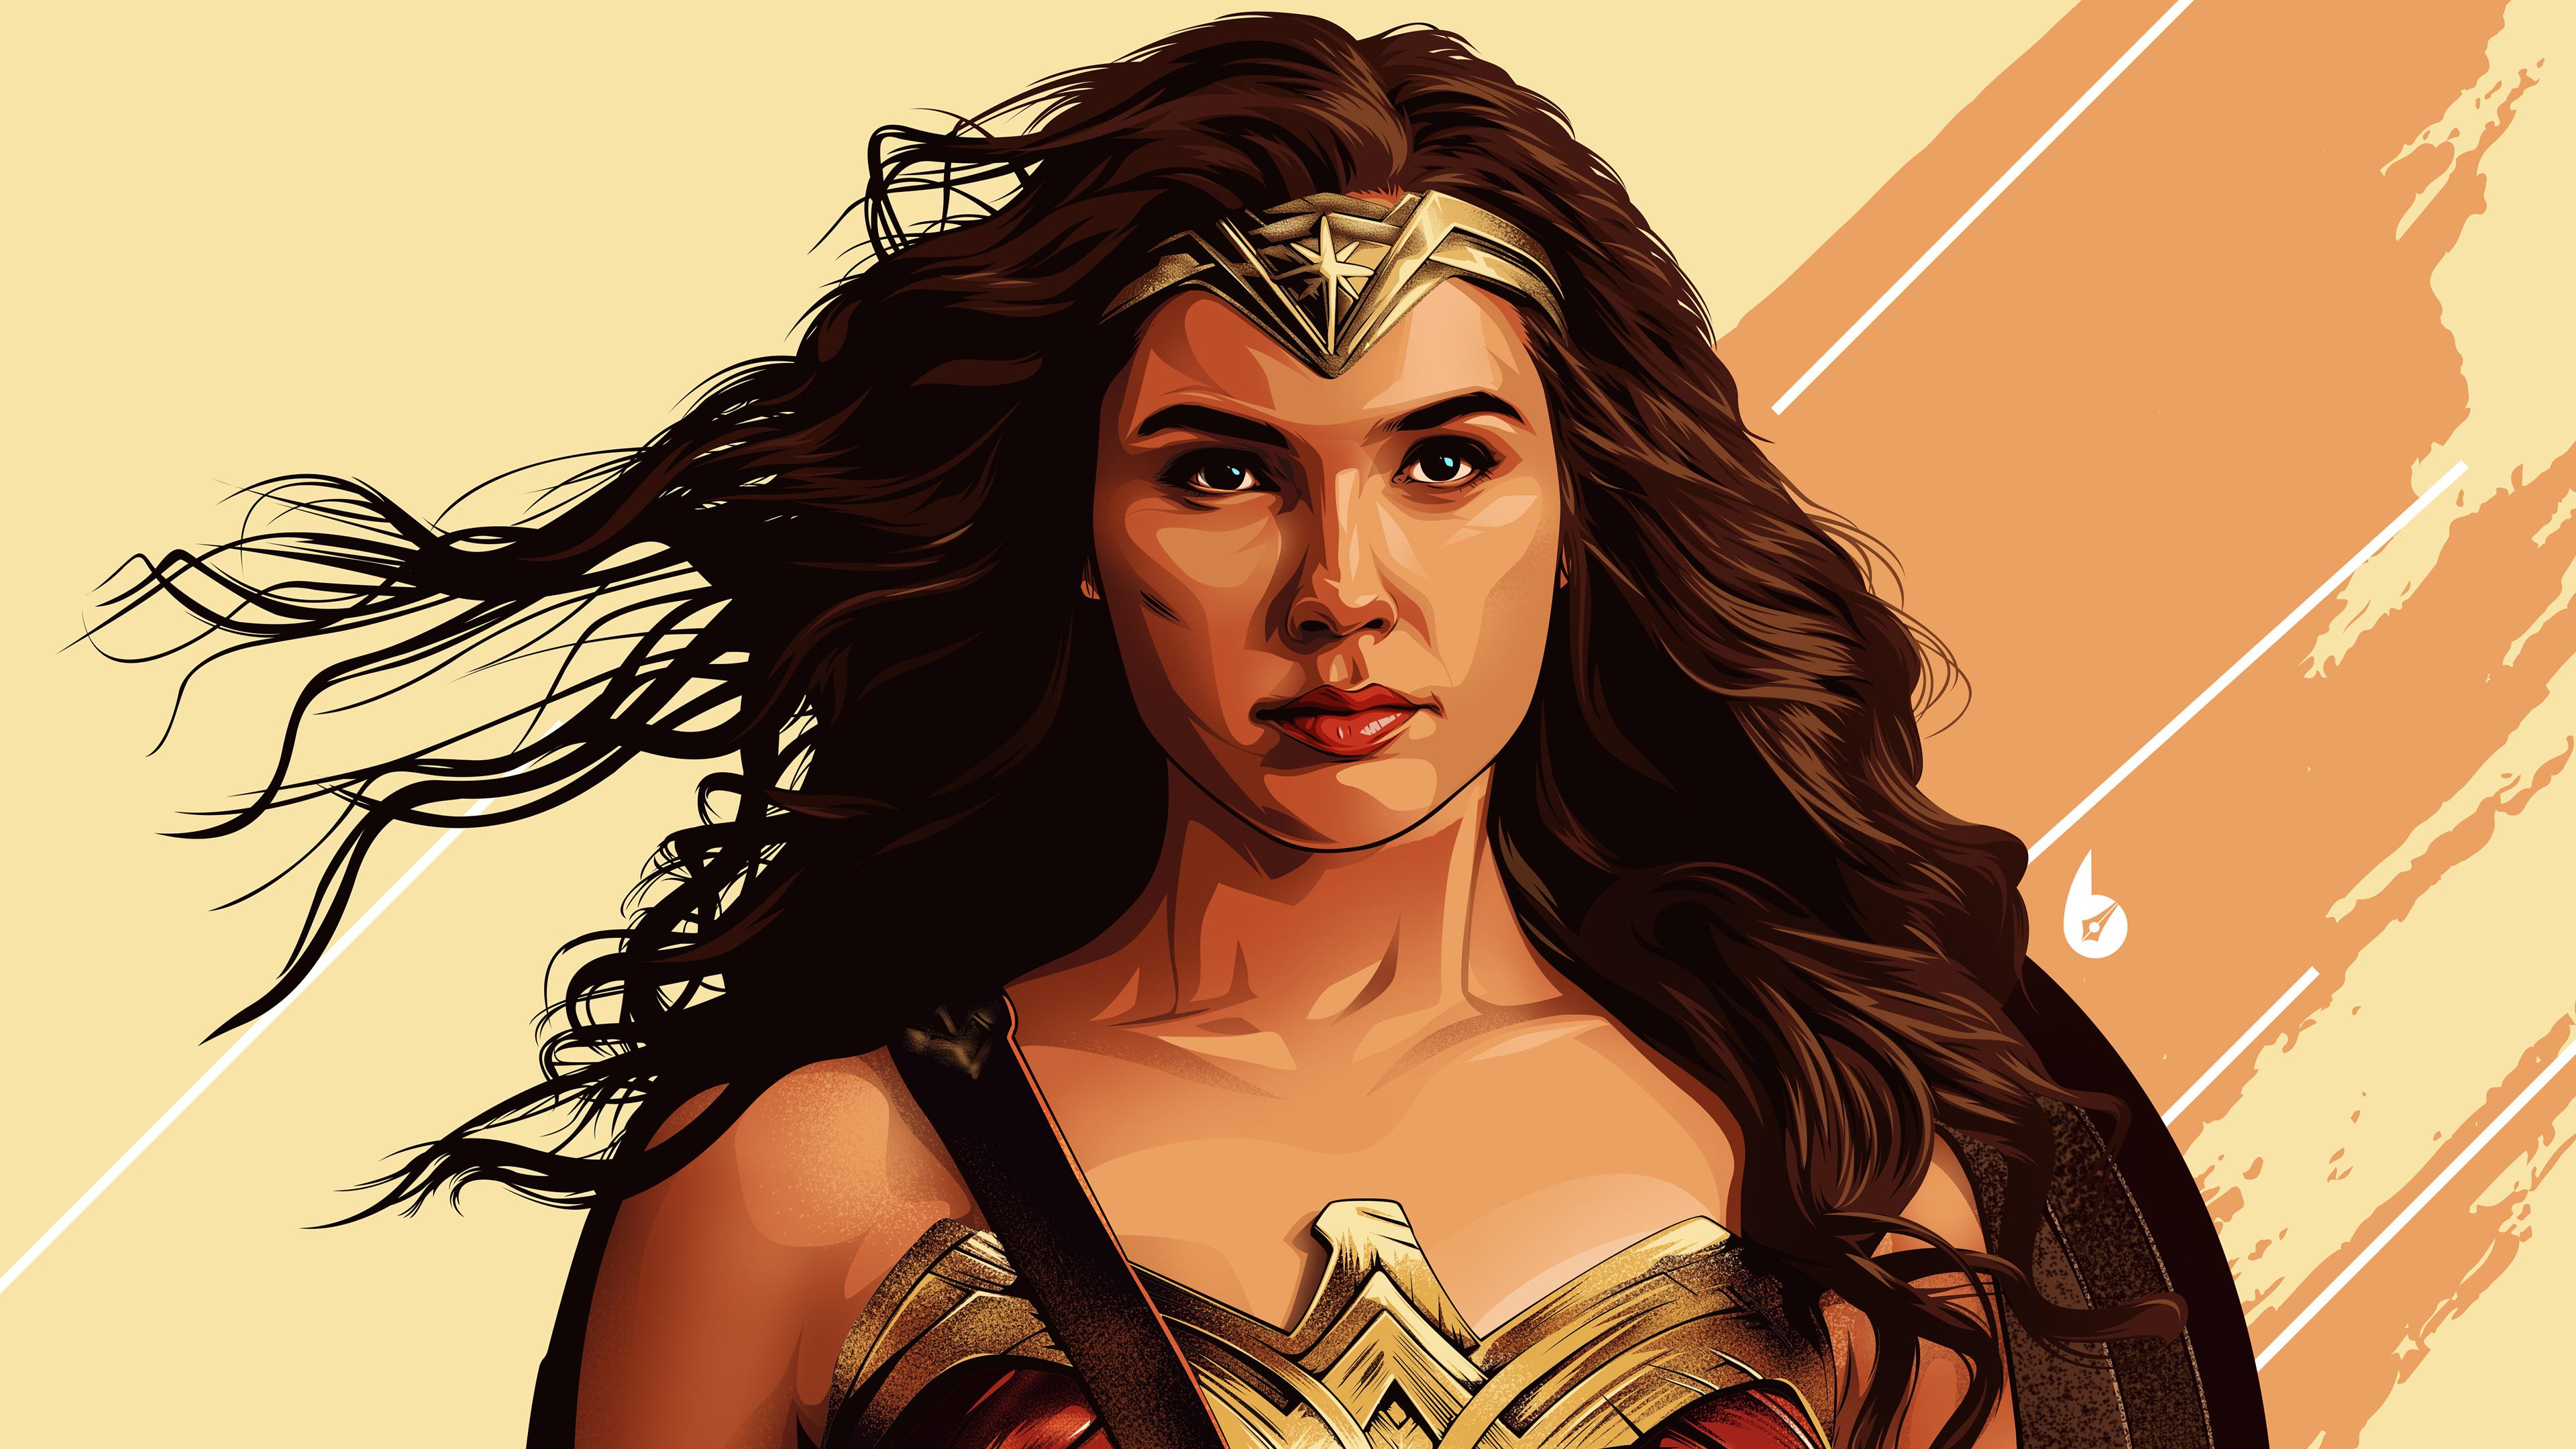 Wallpaper 4k Wonder Woman 4k Arts 4k Wallpapers Artwork Wallpapers